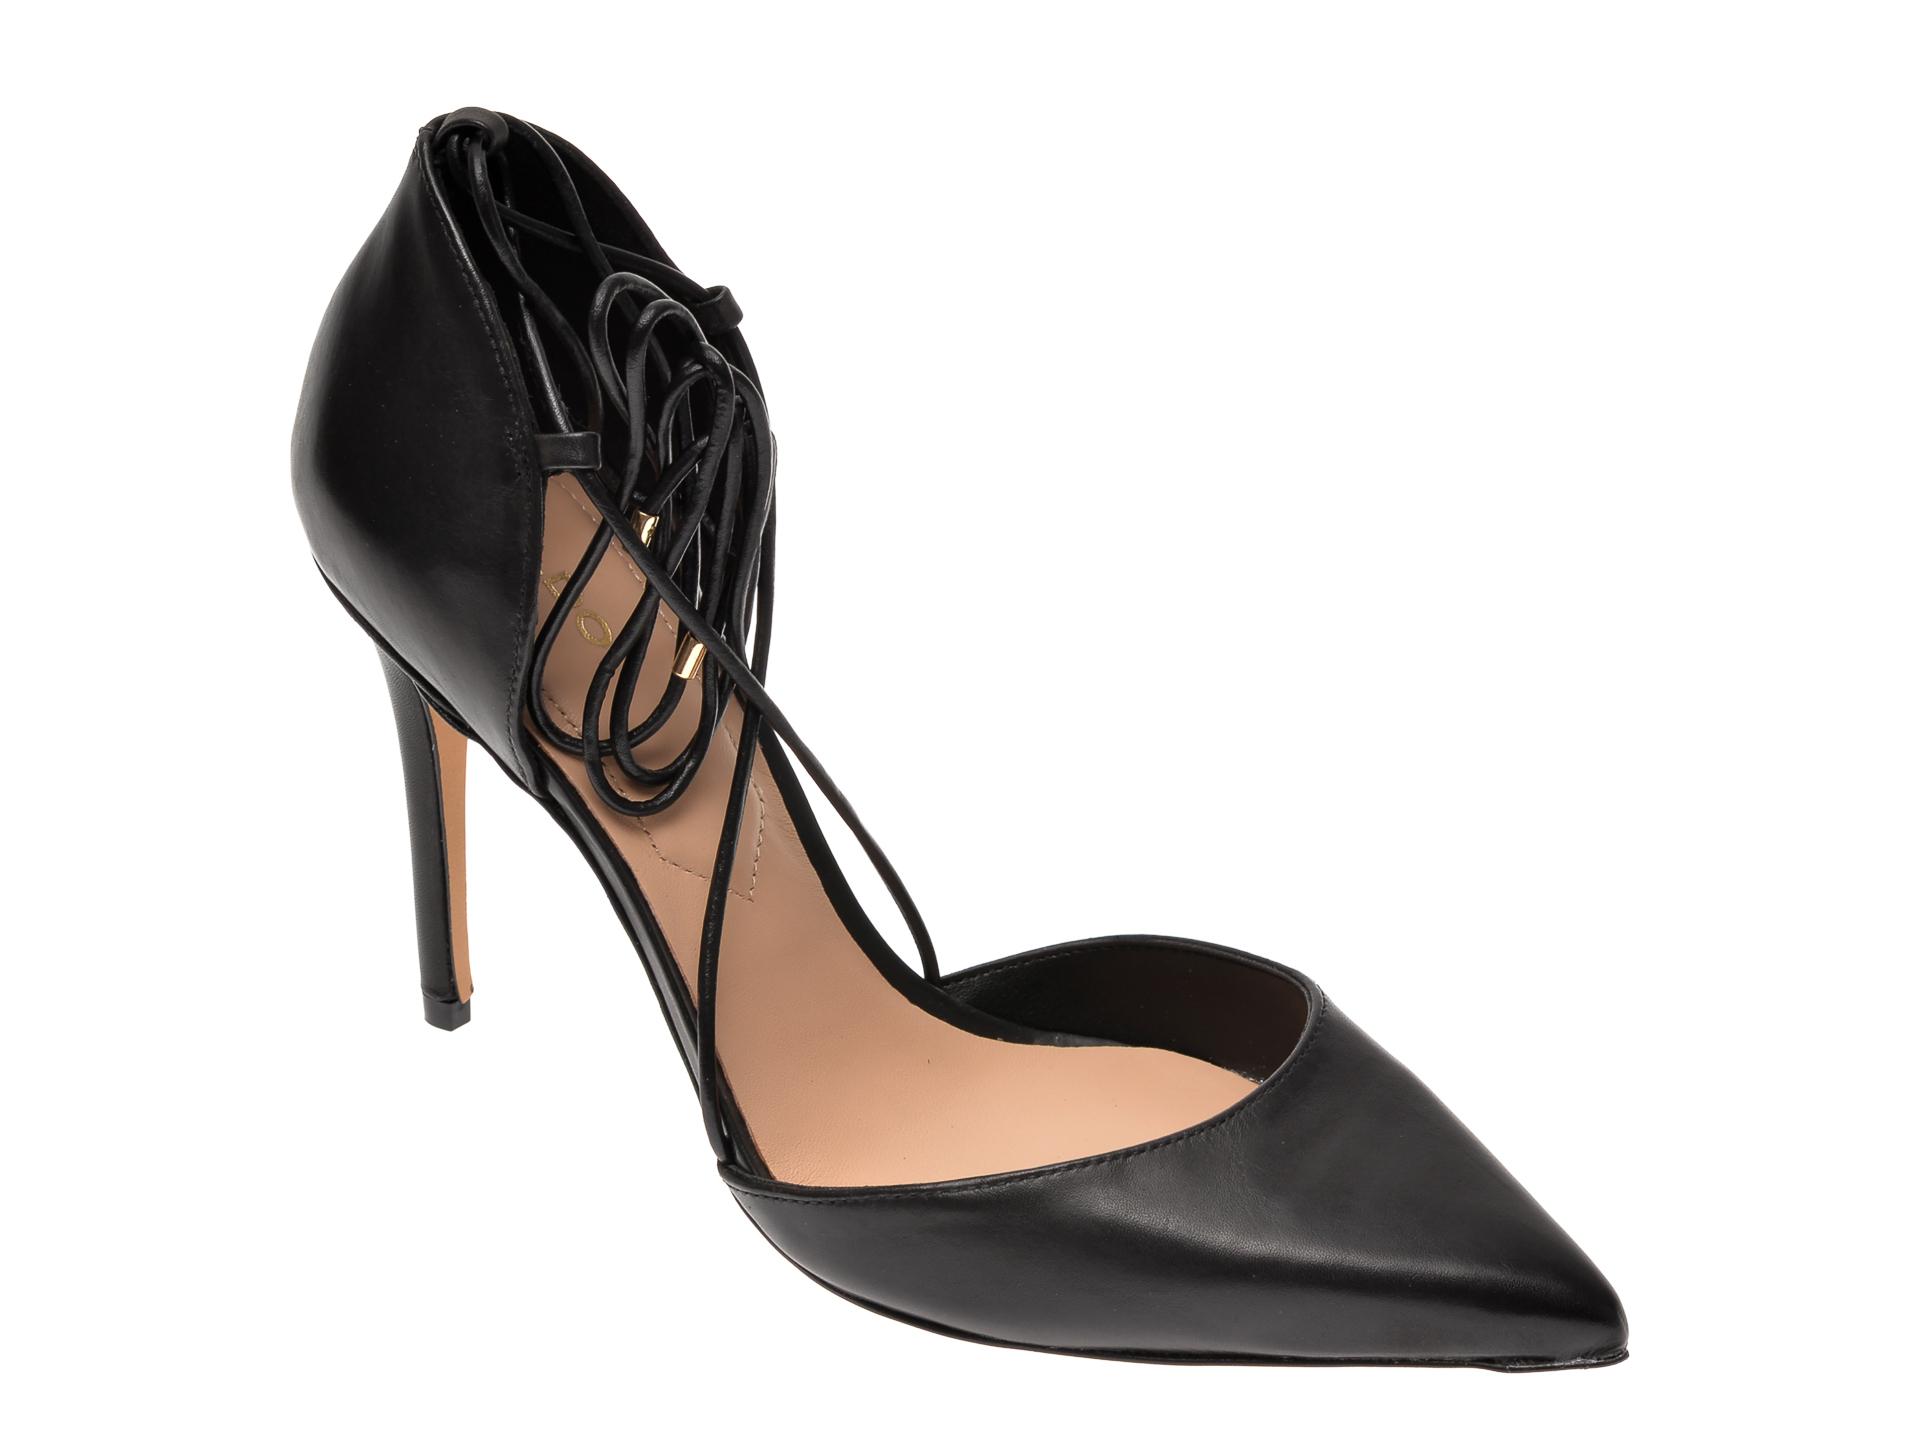 Pantofi ALDO negri, Finsbury001, din piele naturala imagine otter.ro